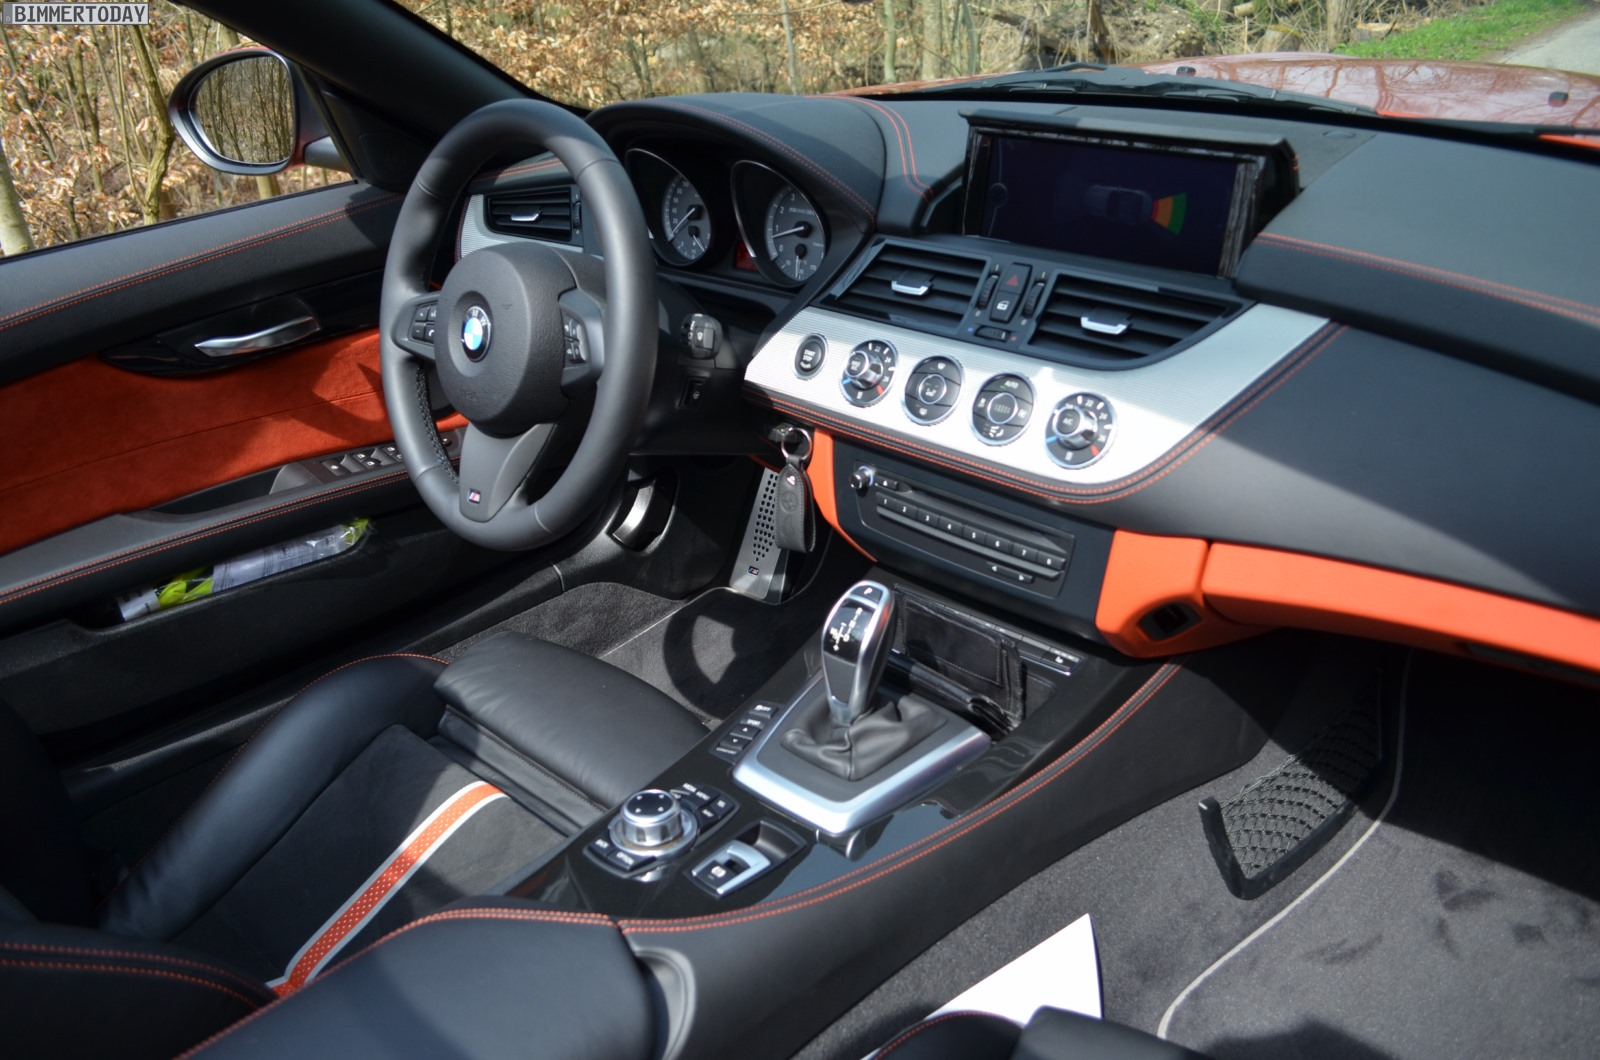 Fahrbericht Bmw Z4 Sdrive35is 2013 Roadster Mit Minimal